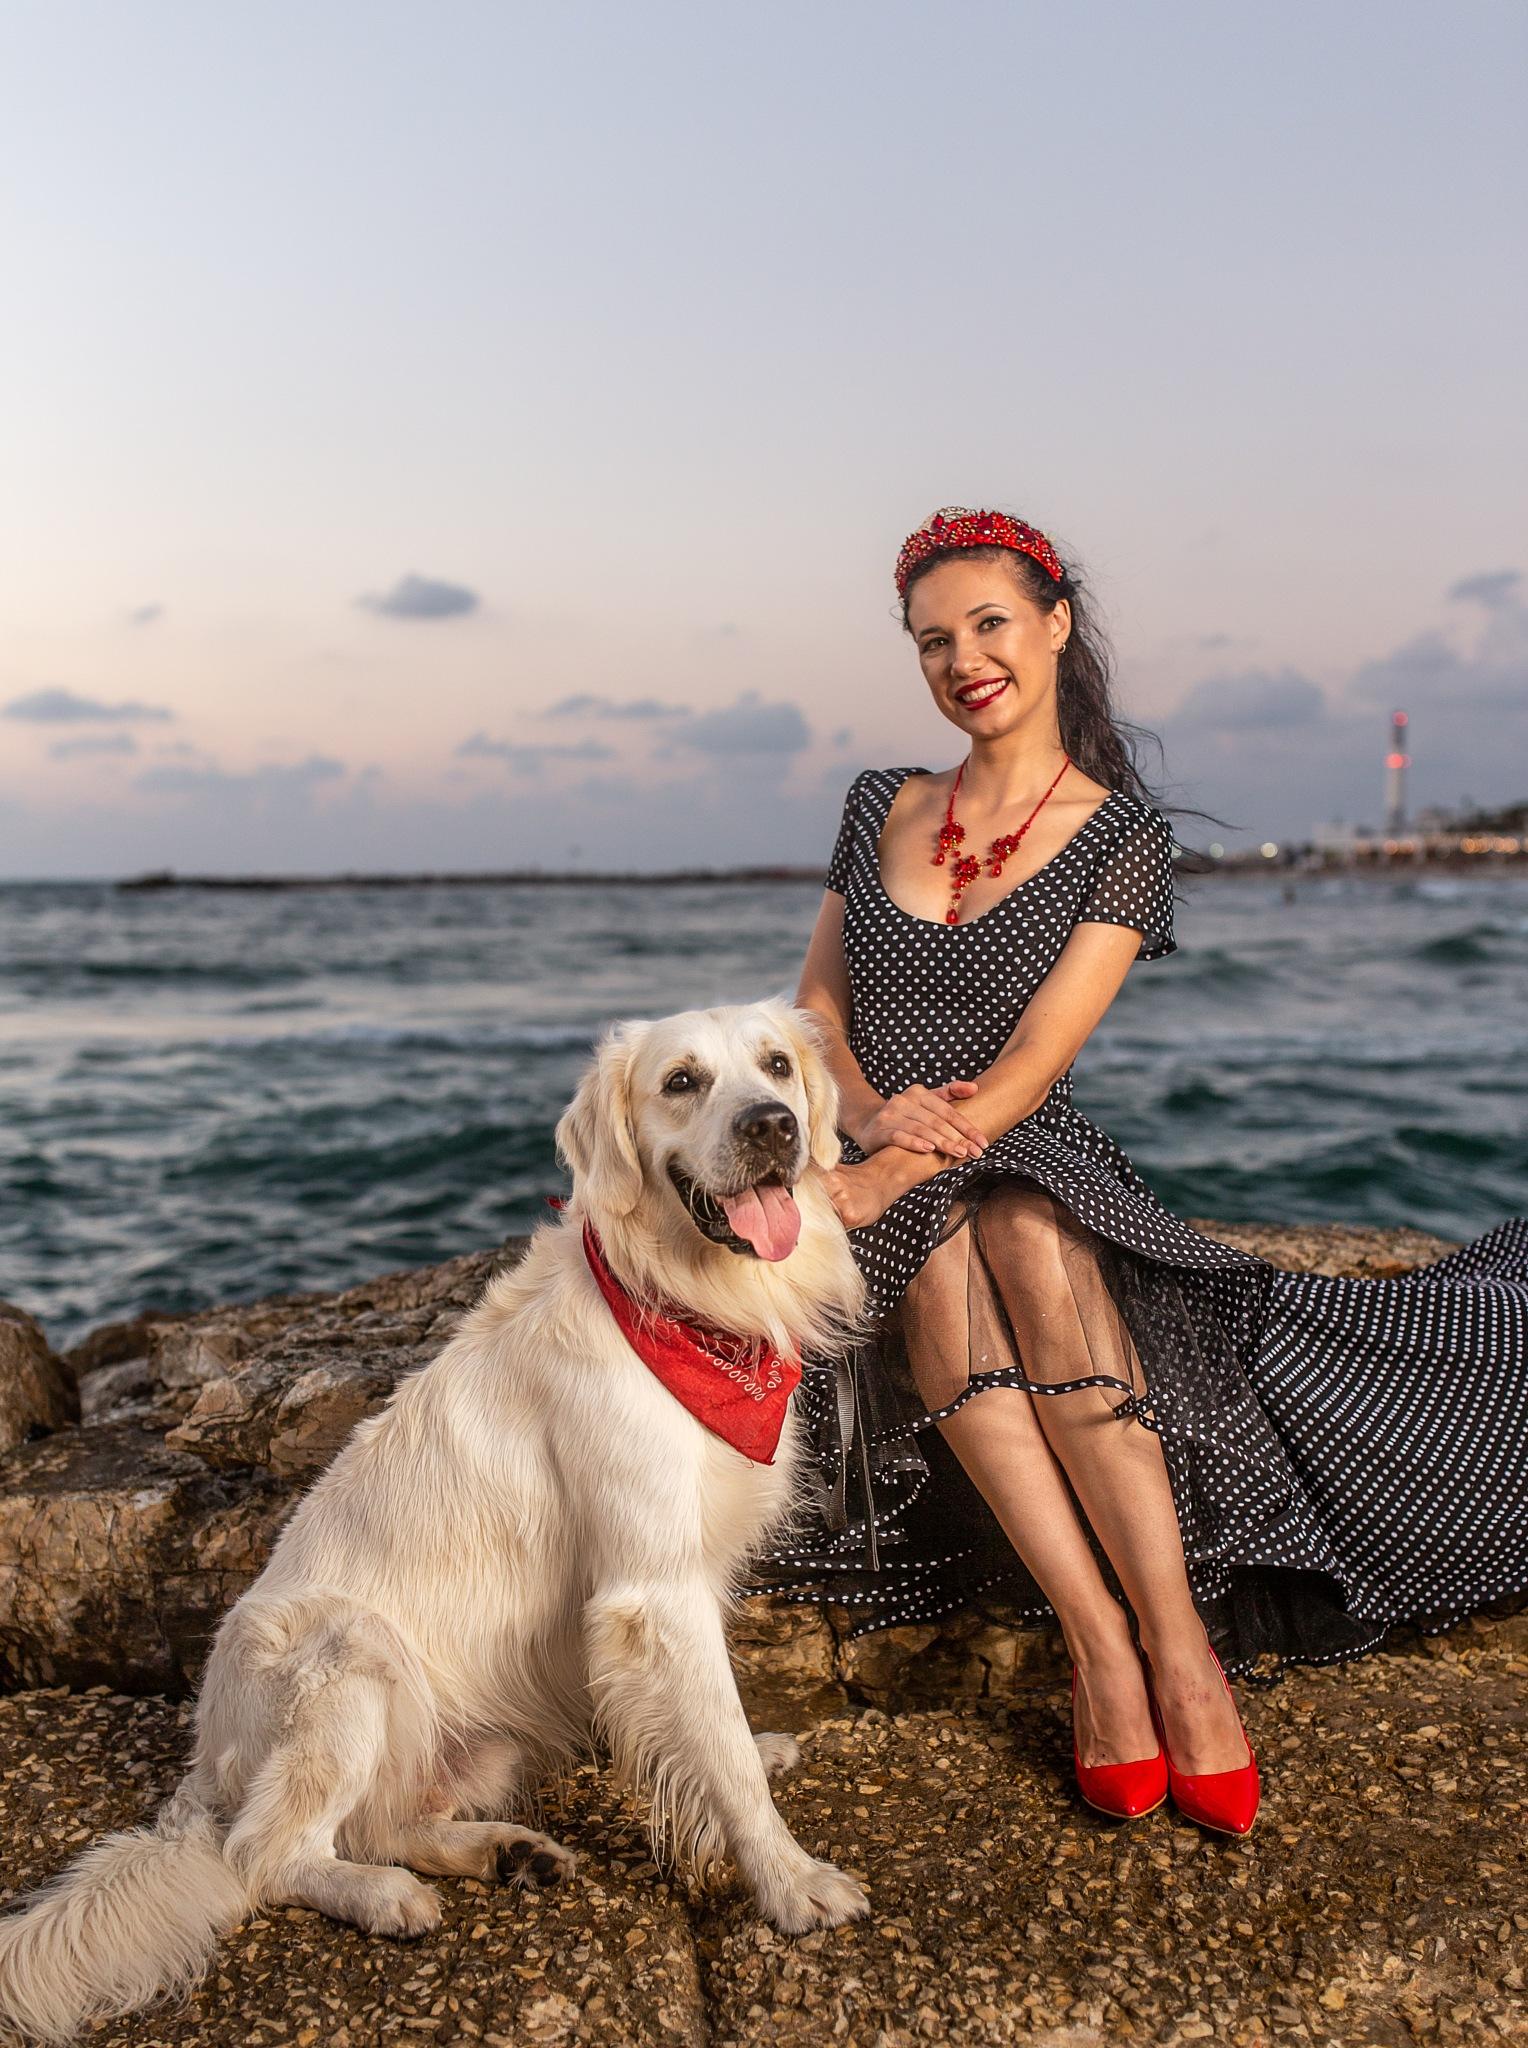 Woman's best friend by Selby